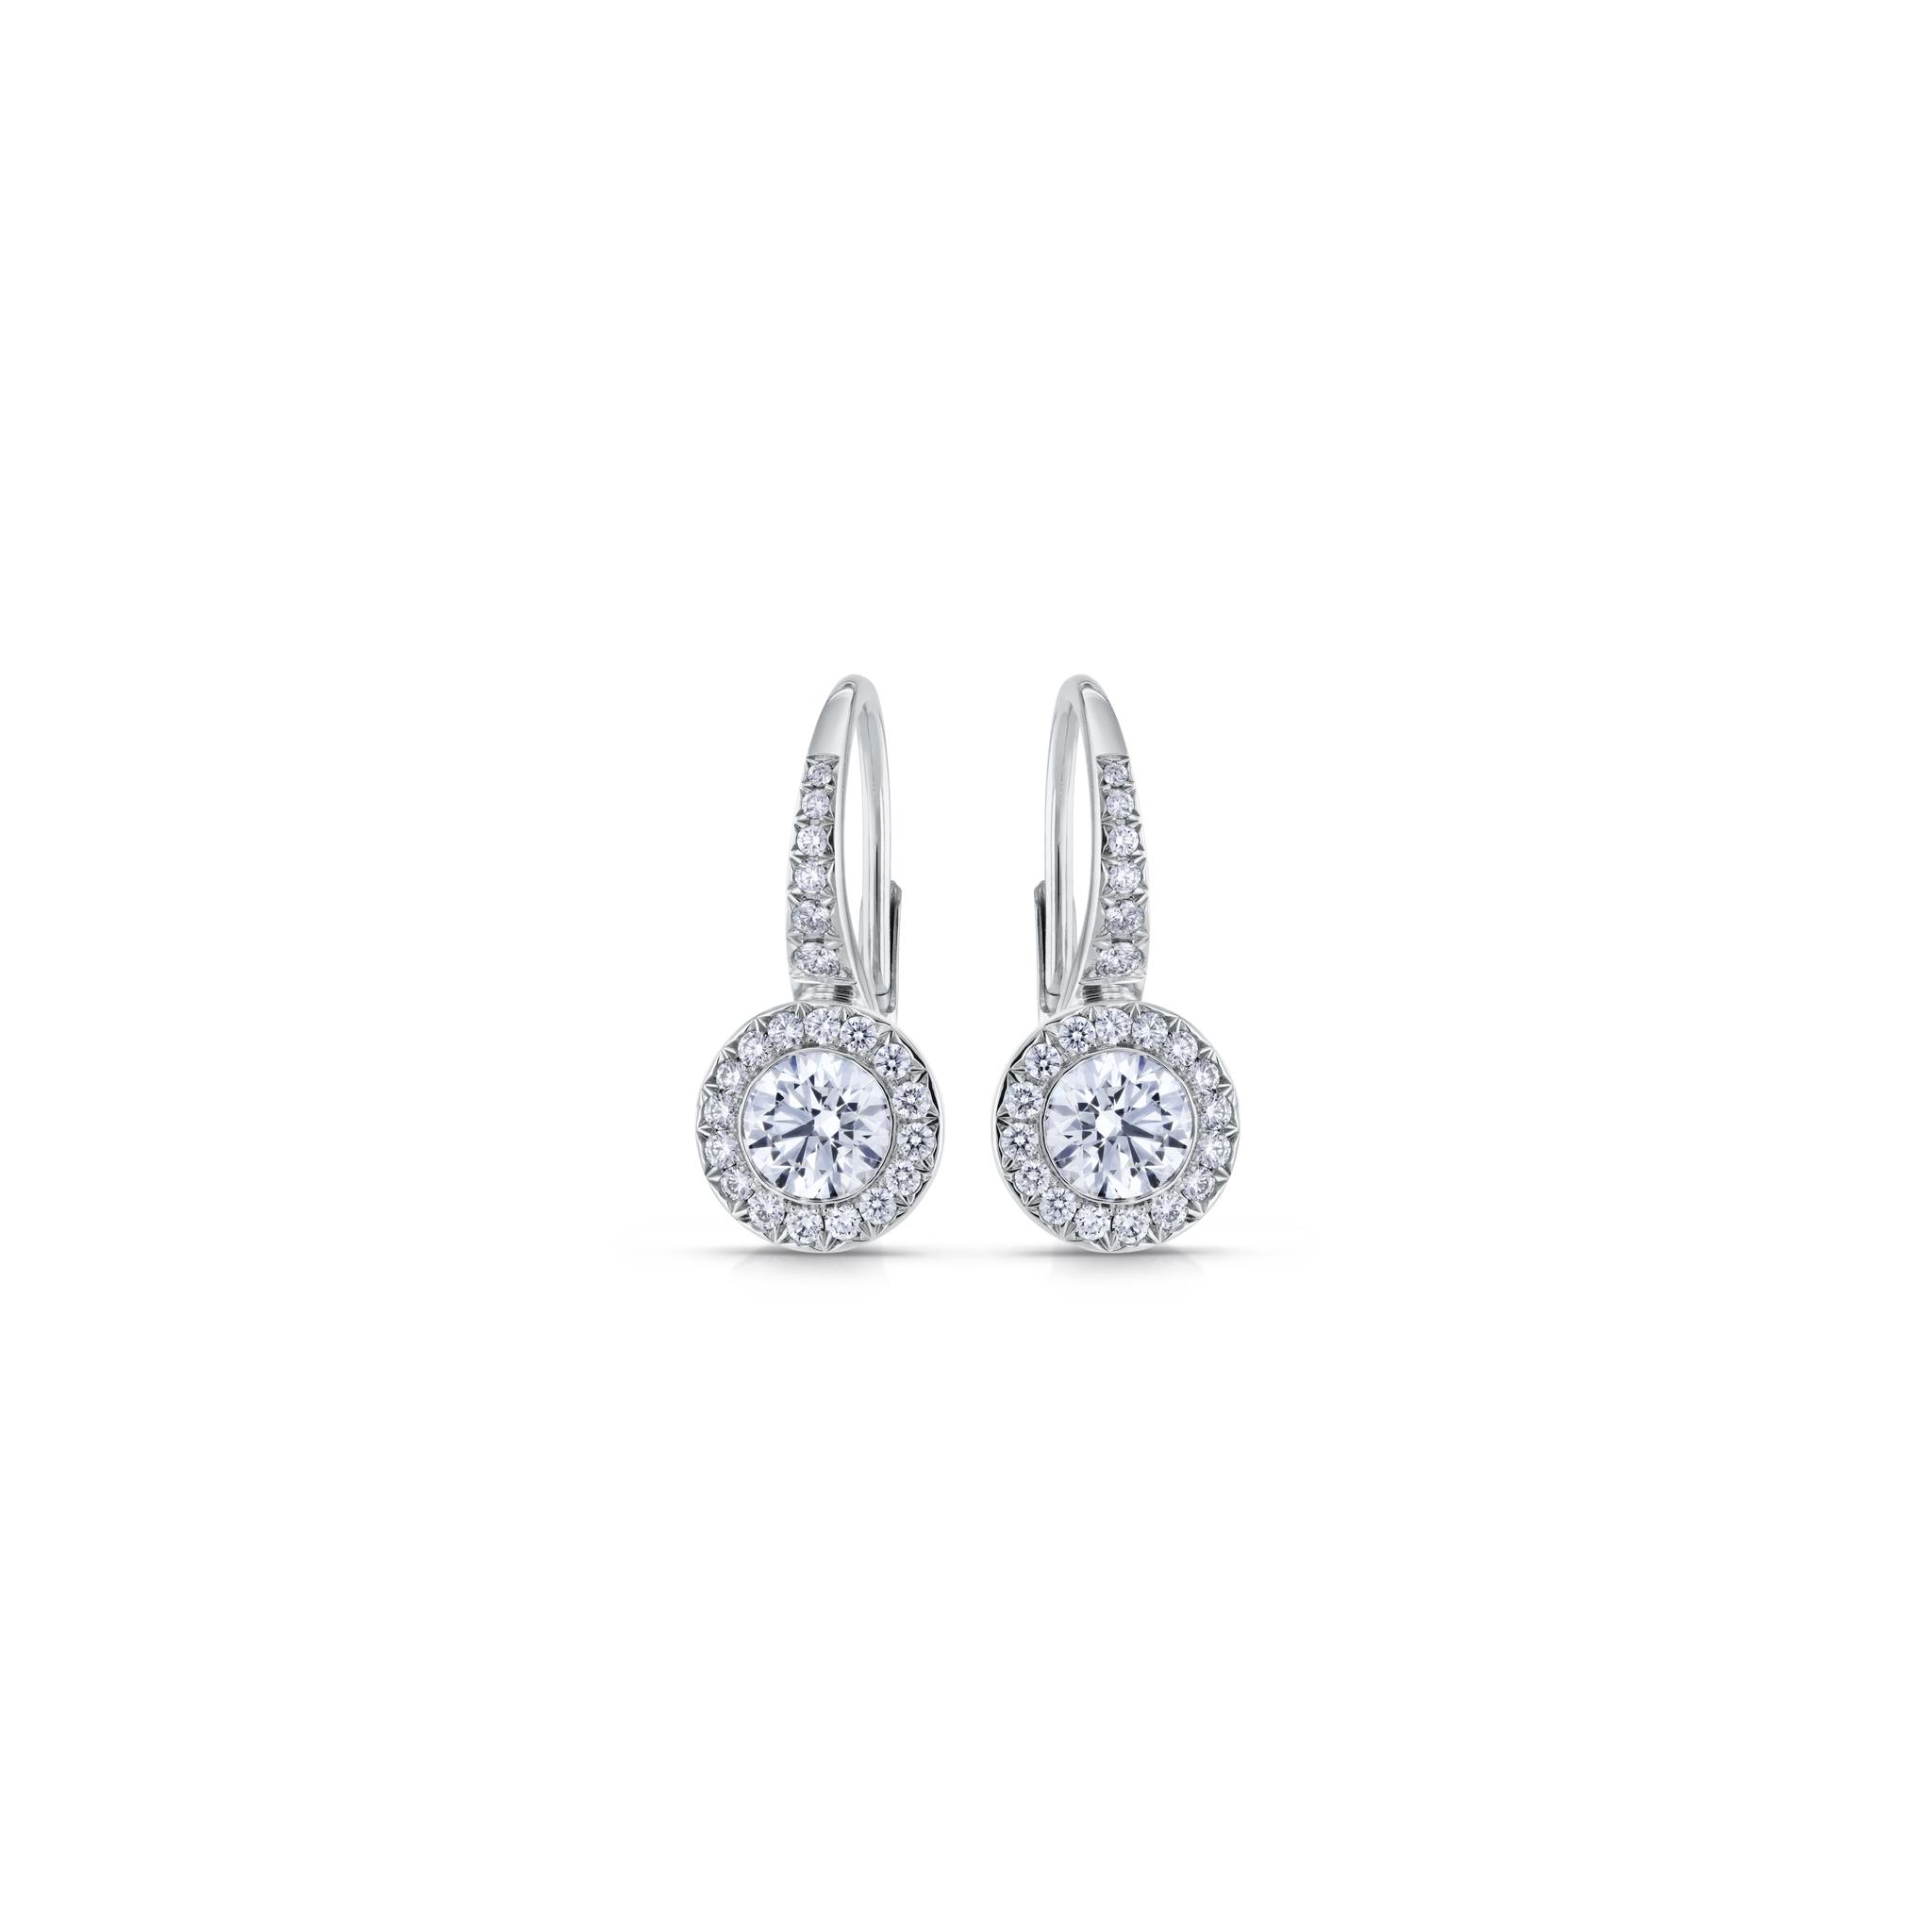 Earrings with diamonds